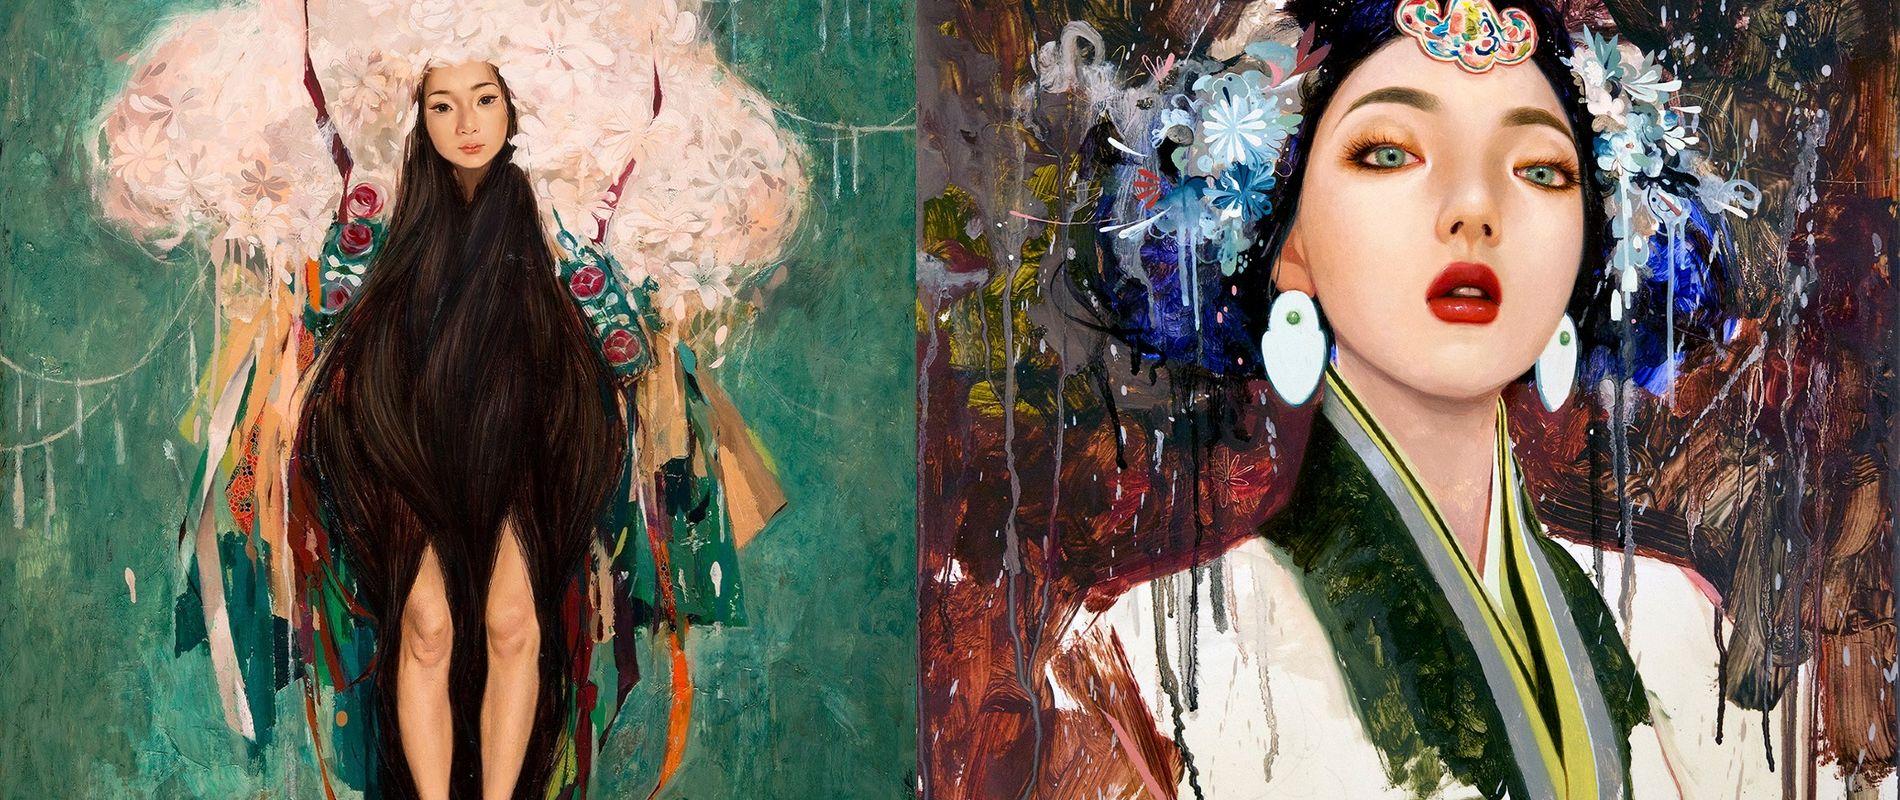 Exquisite Paintings by Soey Milk